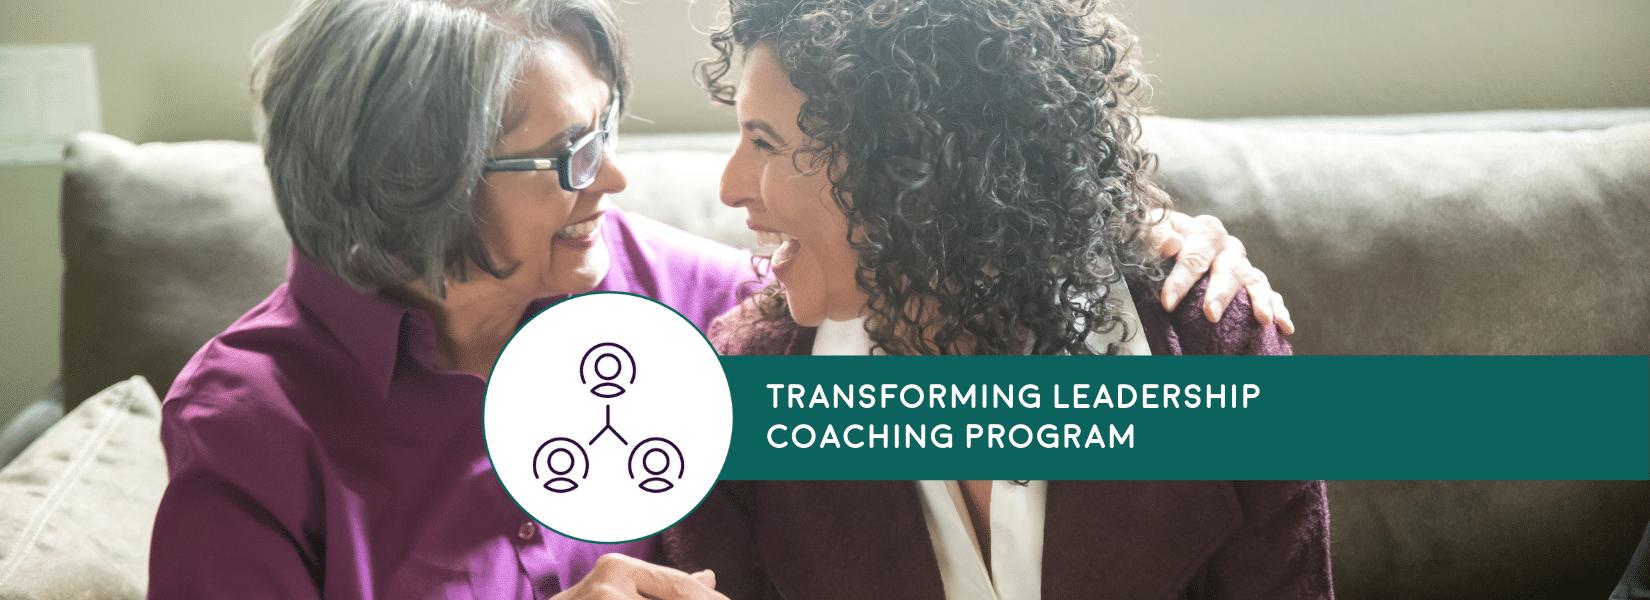 Tr. Leadership Coaching Banner